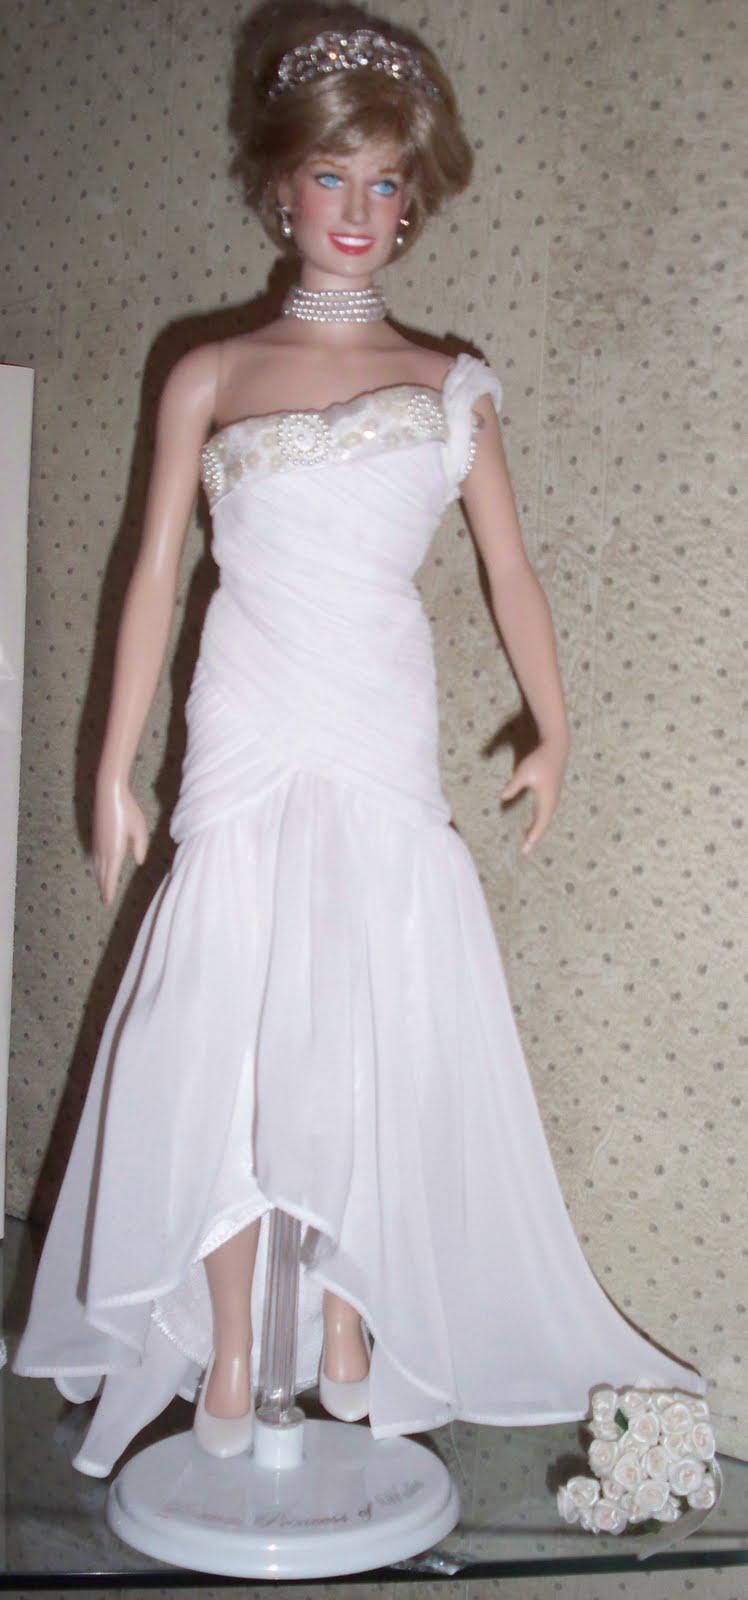 Doll Happy: Princess Diana Franklin Mint Wardrobe Doll